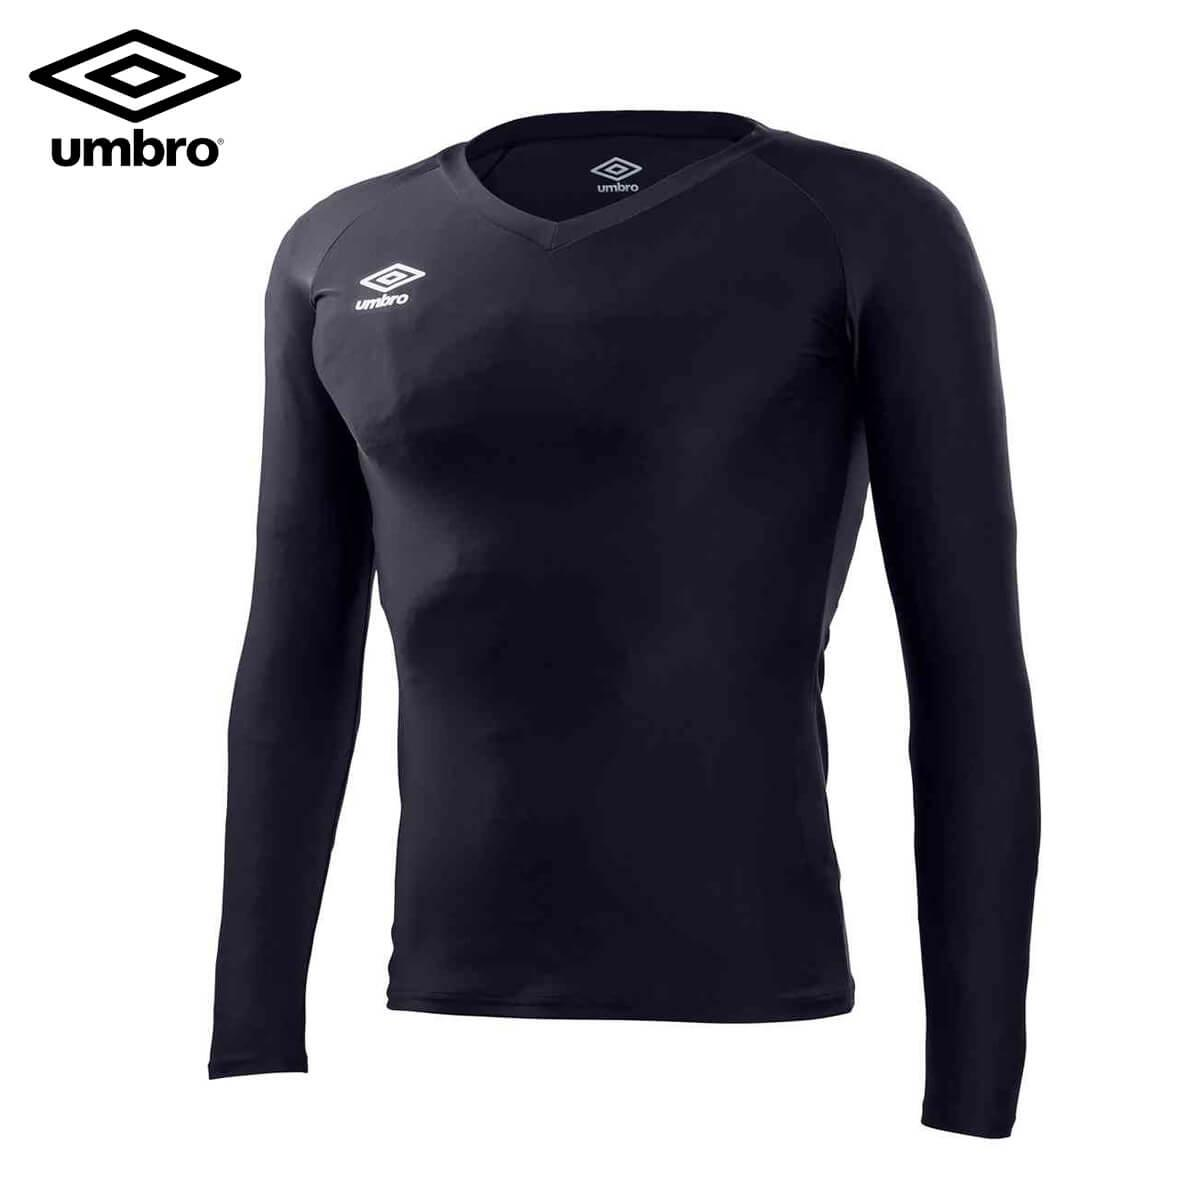 umbro 店舗 UAS9701L L S パワーインナー セール商品 Vネックシャツ ウェア ユニ メール便可 サッカー 取り寄せ 2020SS アンブロ